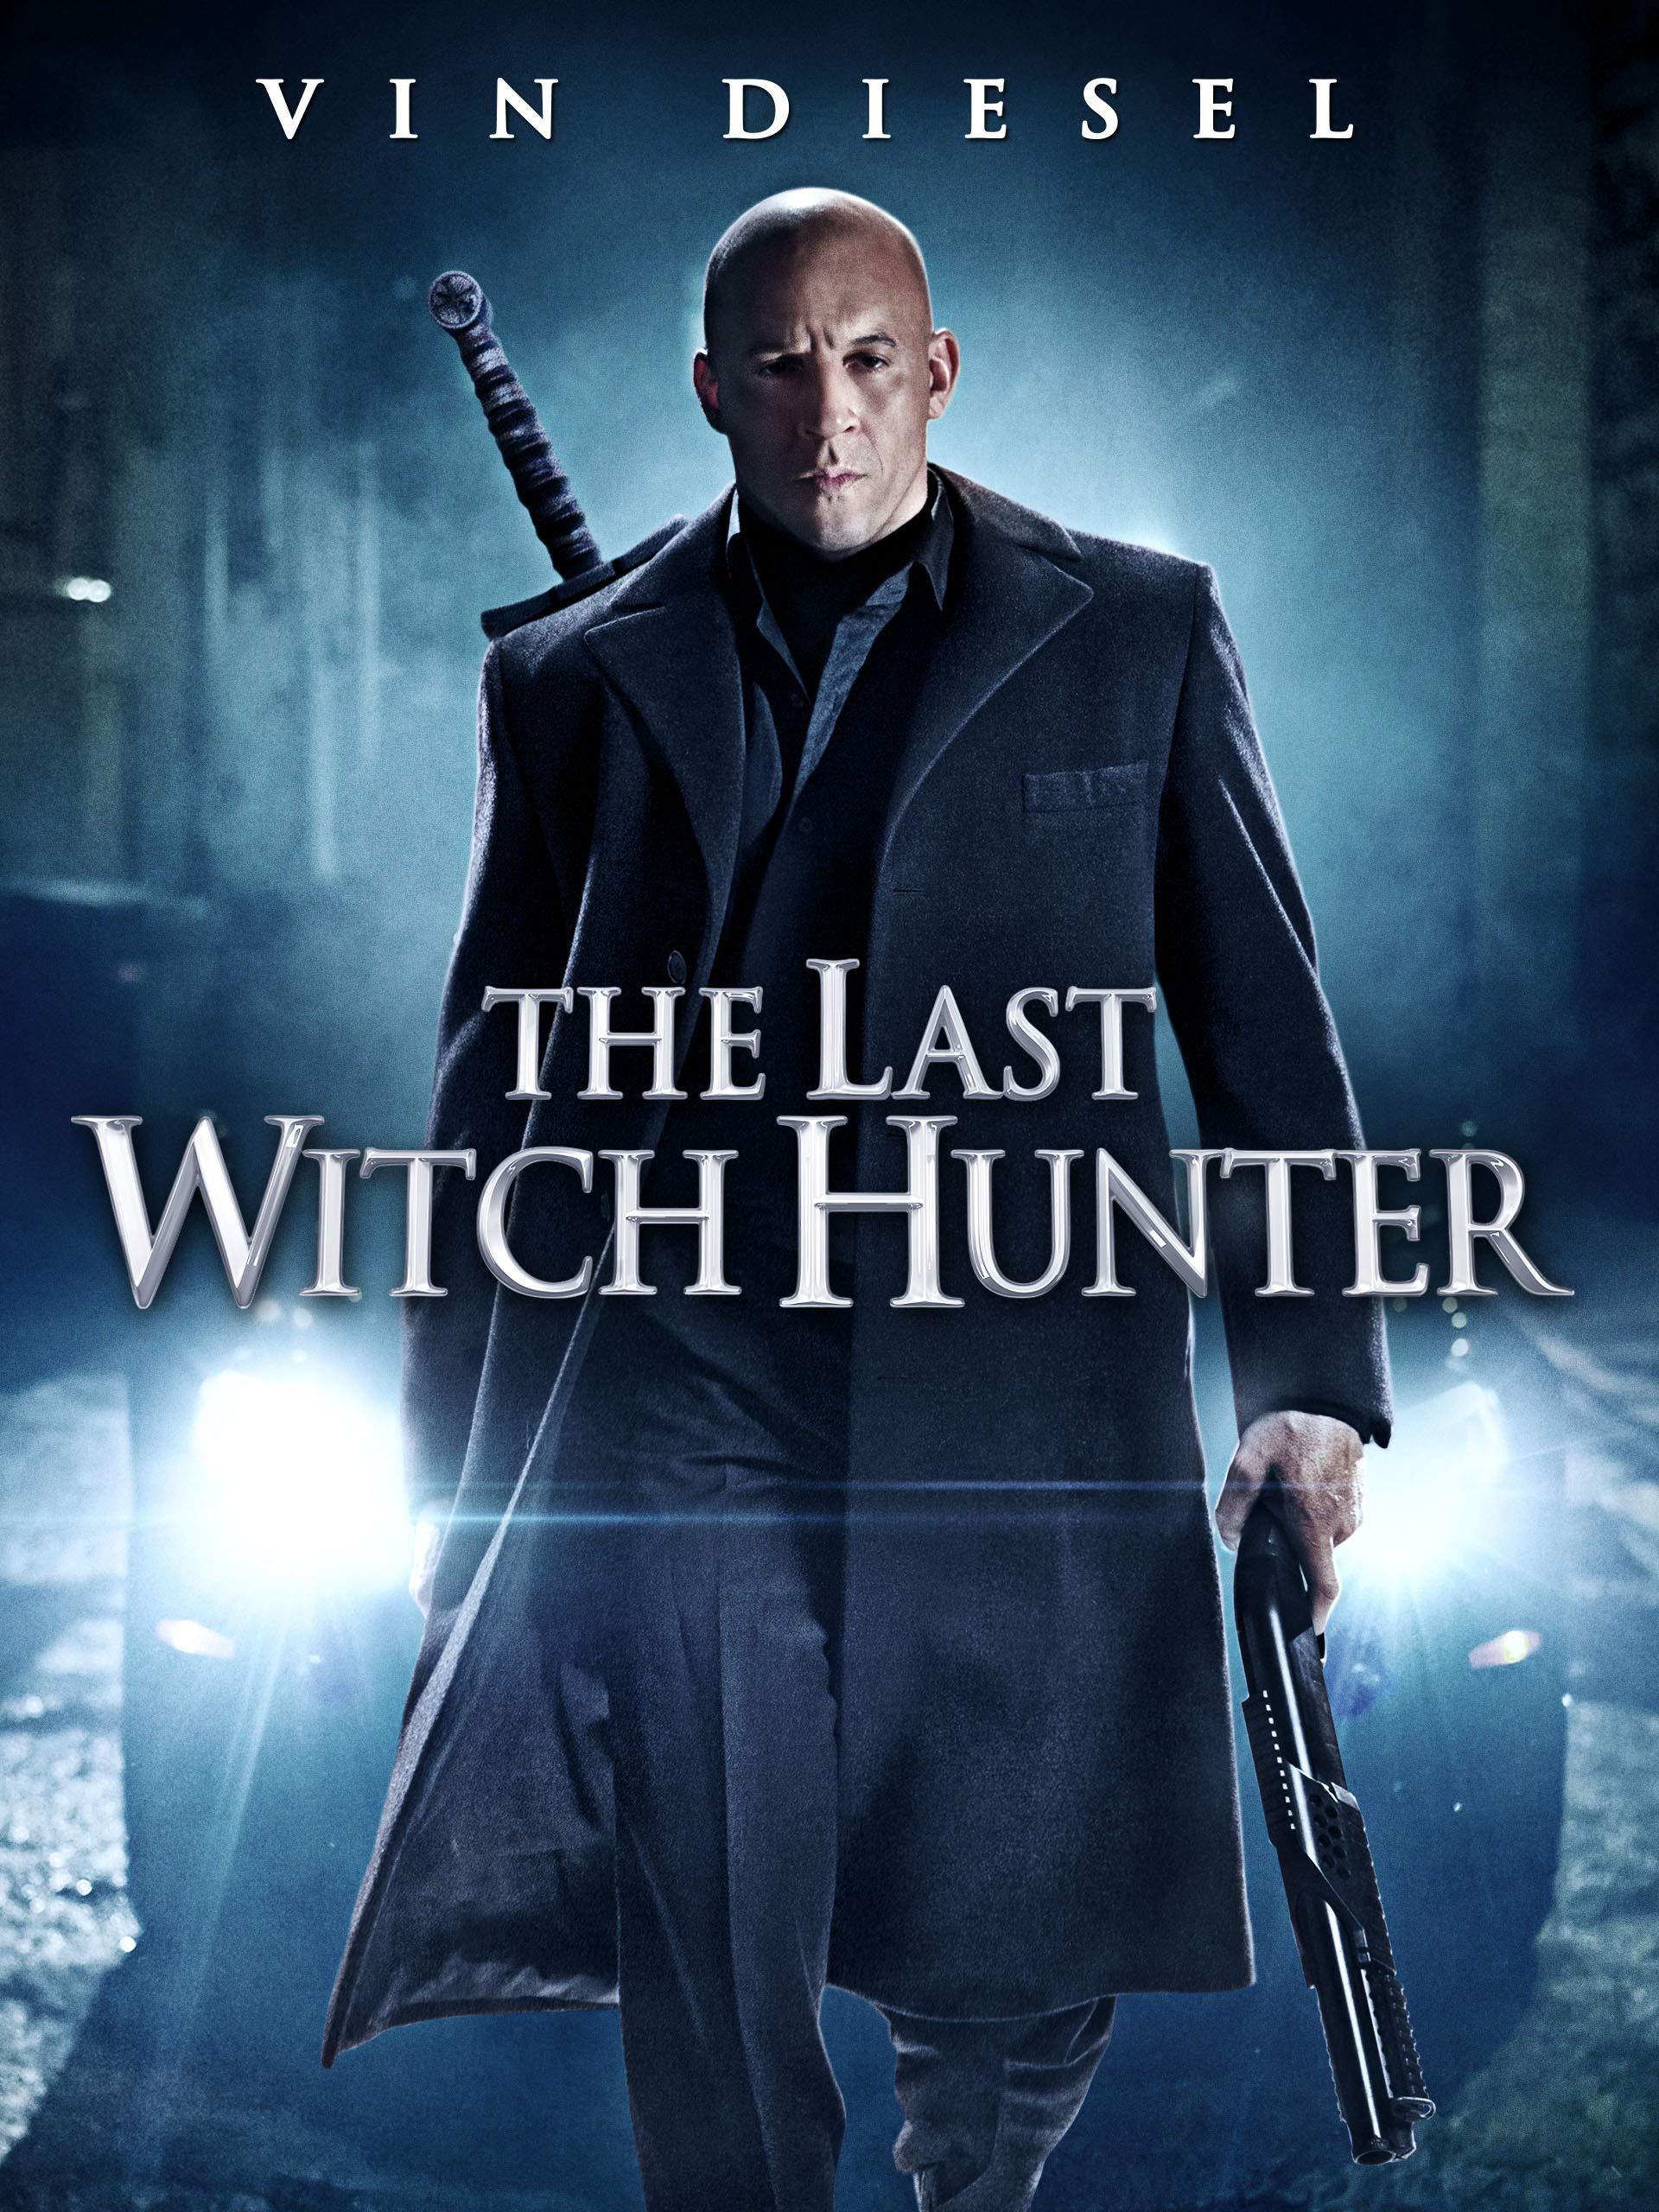 Amazon.com: The Last Witch Hunter: Vin Diesel, Elijah Wood, Rose ...